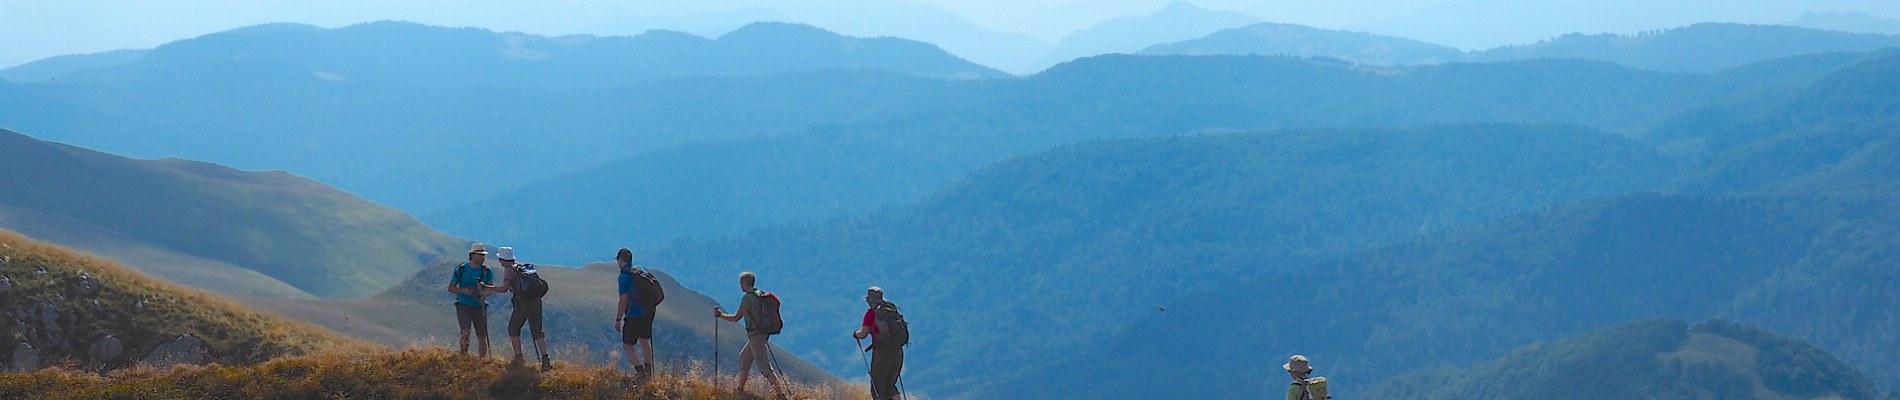 montenegro reise